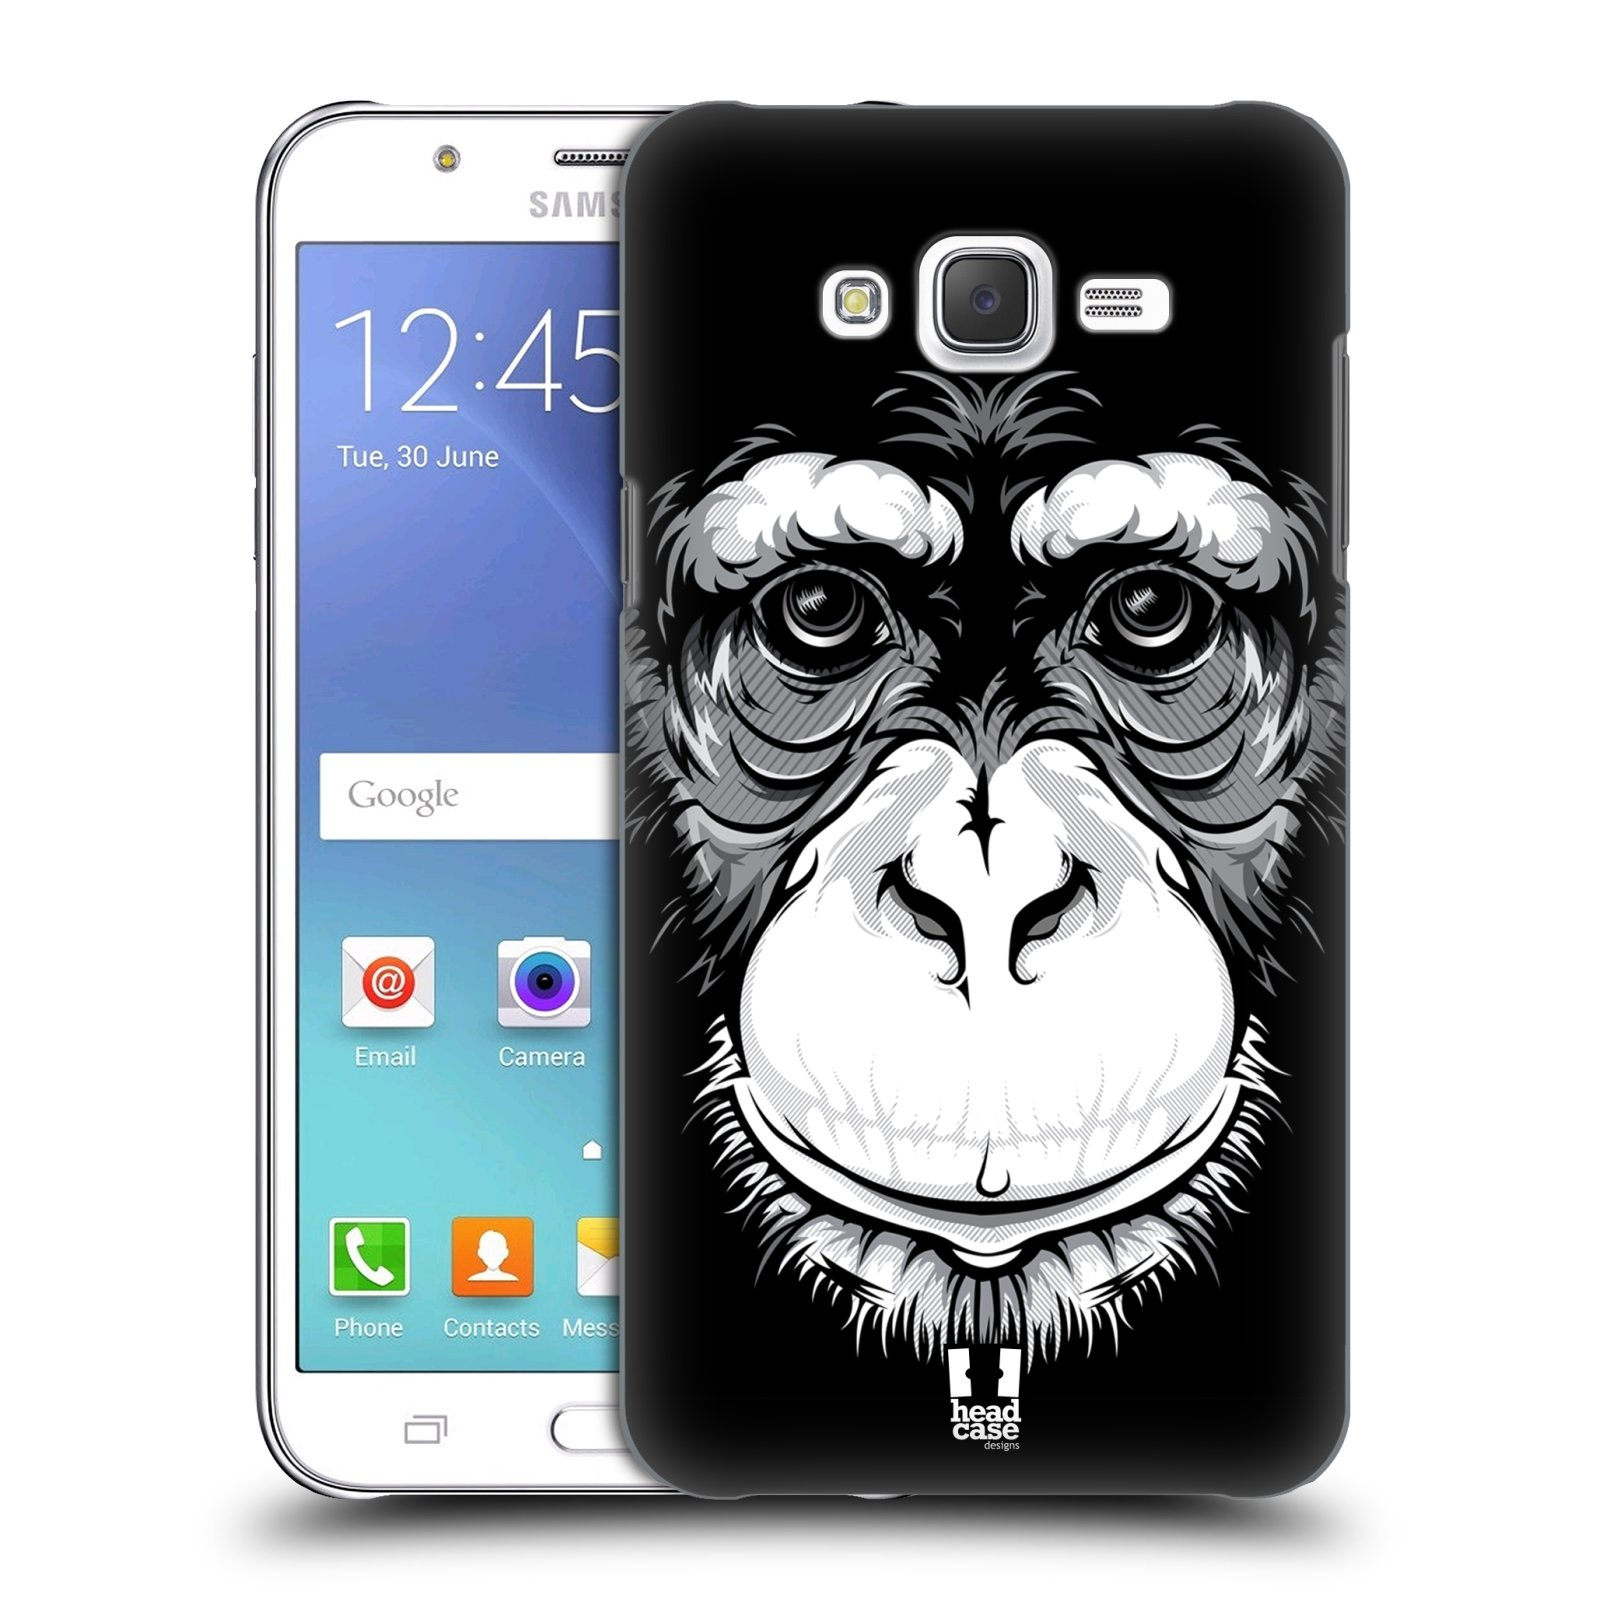 HEAD CASE plastový obal na mobil SAMSUNG Galaxy J7, J700 vzor Zvíře kreslená tvář šimpanz